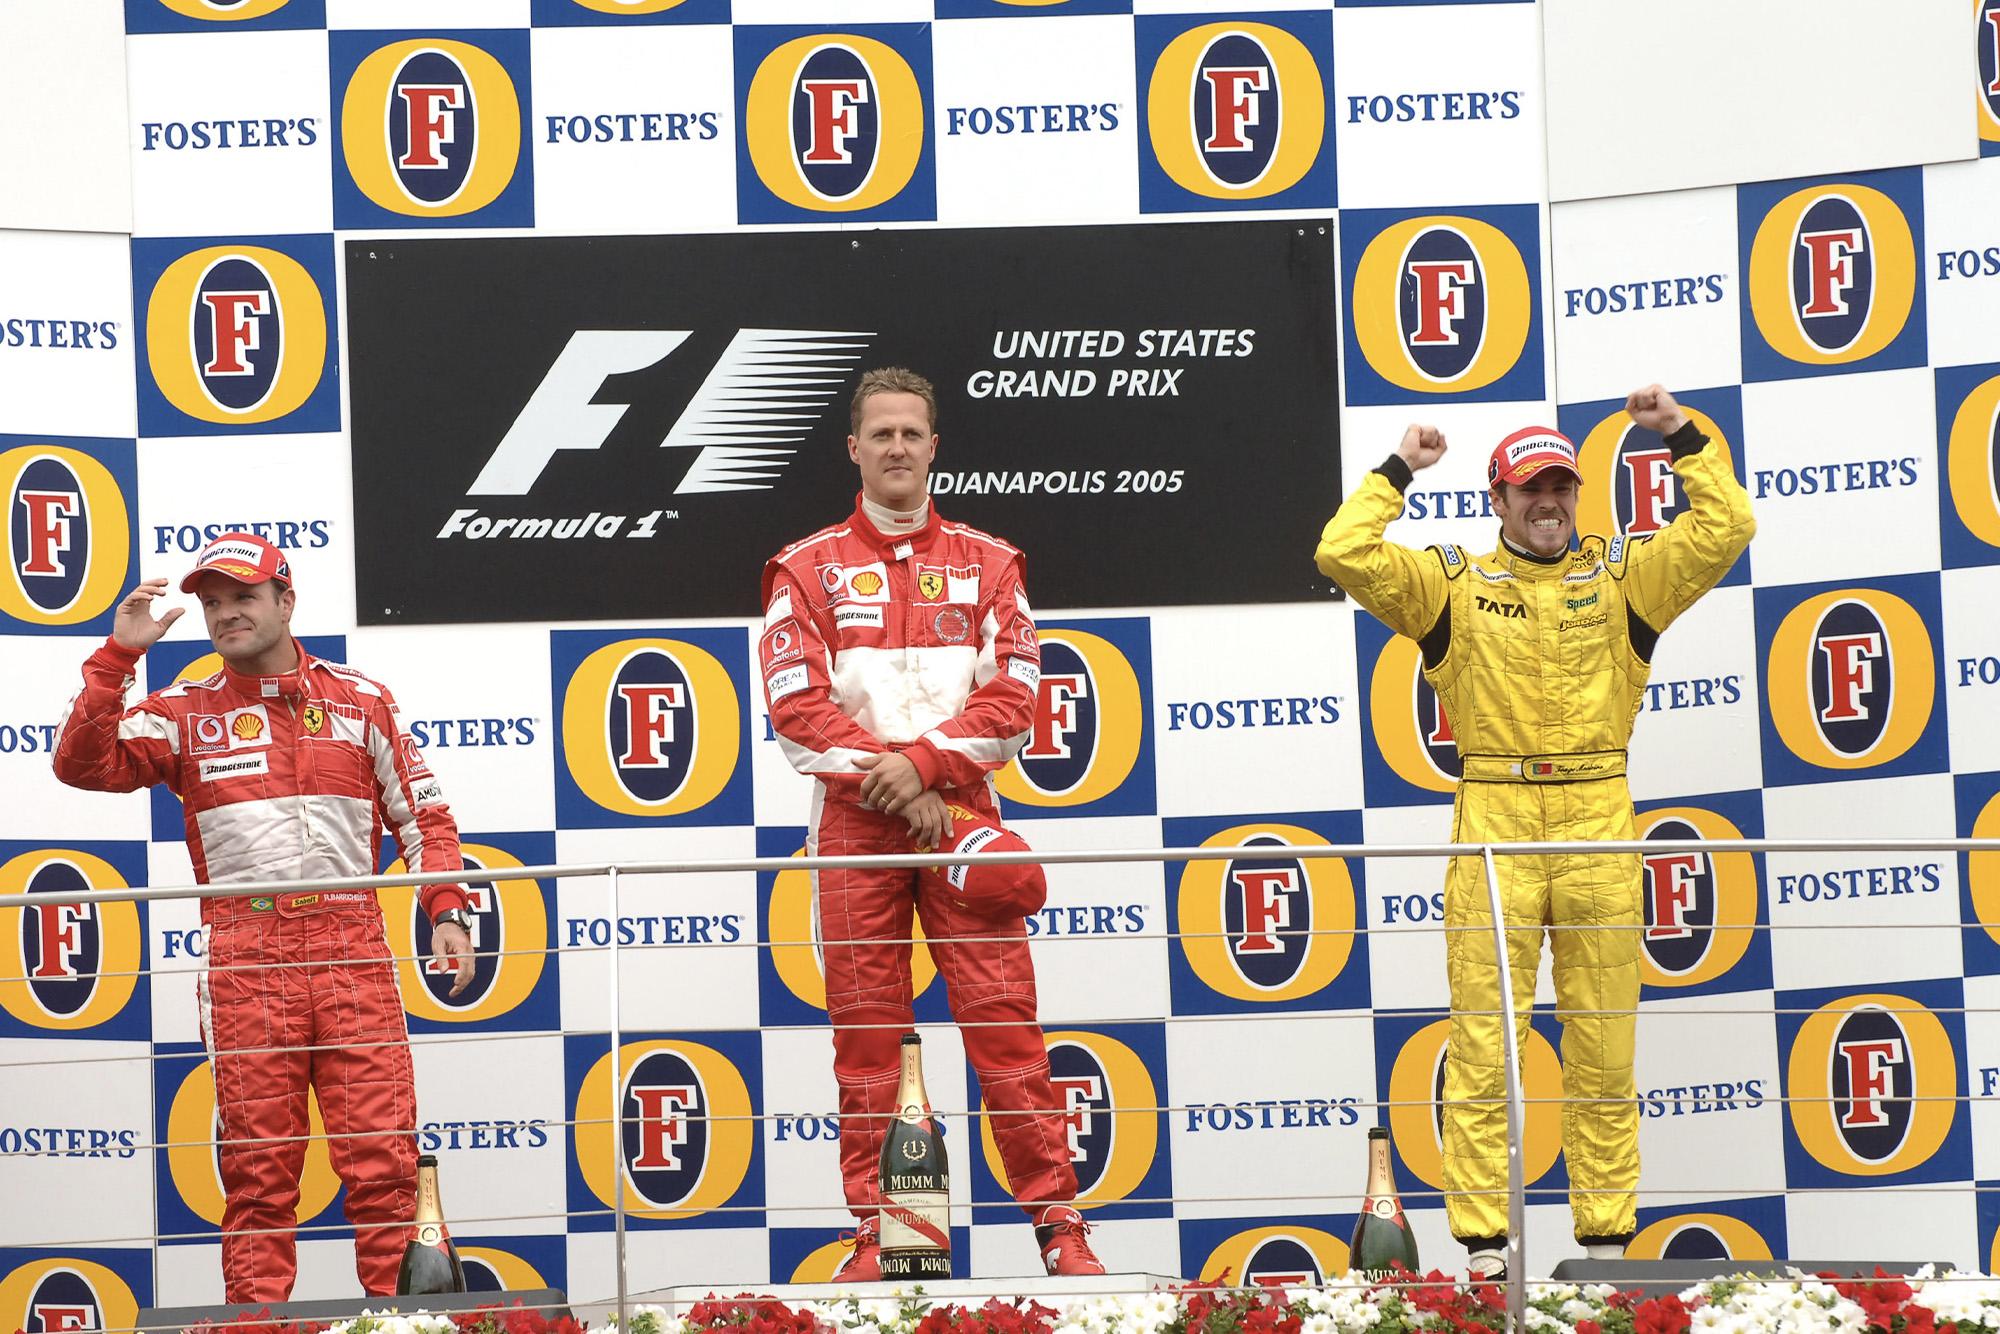 Tiago Monteiro alongside Michael Schumacher and Rubens Barrichello on the podium at the 2005 US Grand Prix